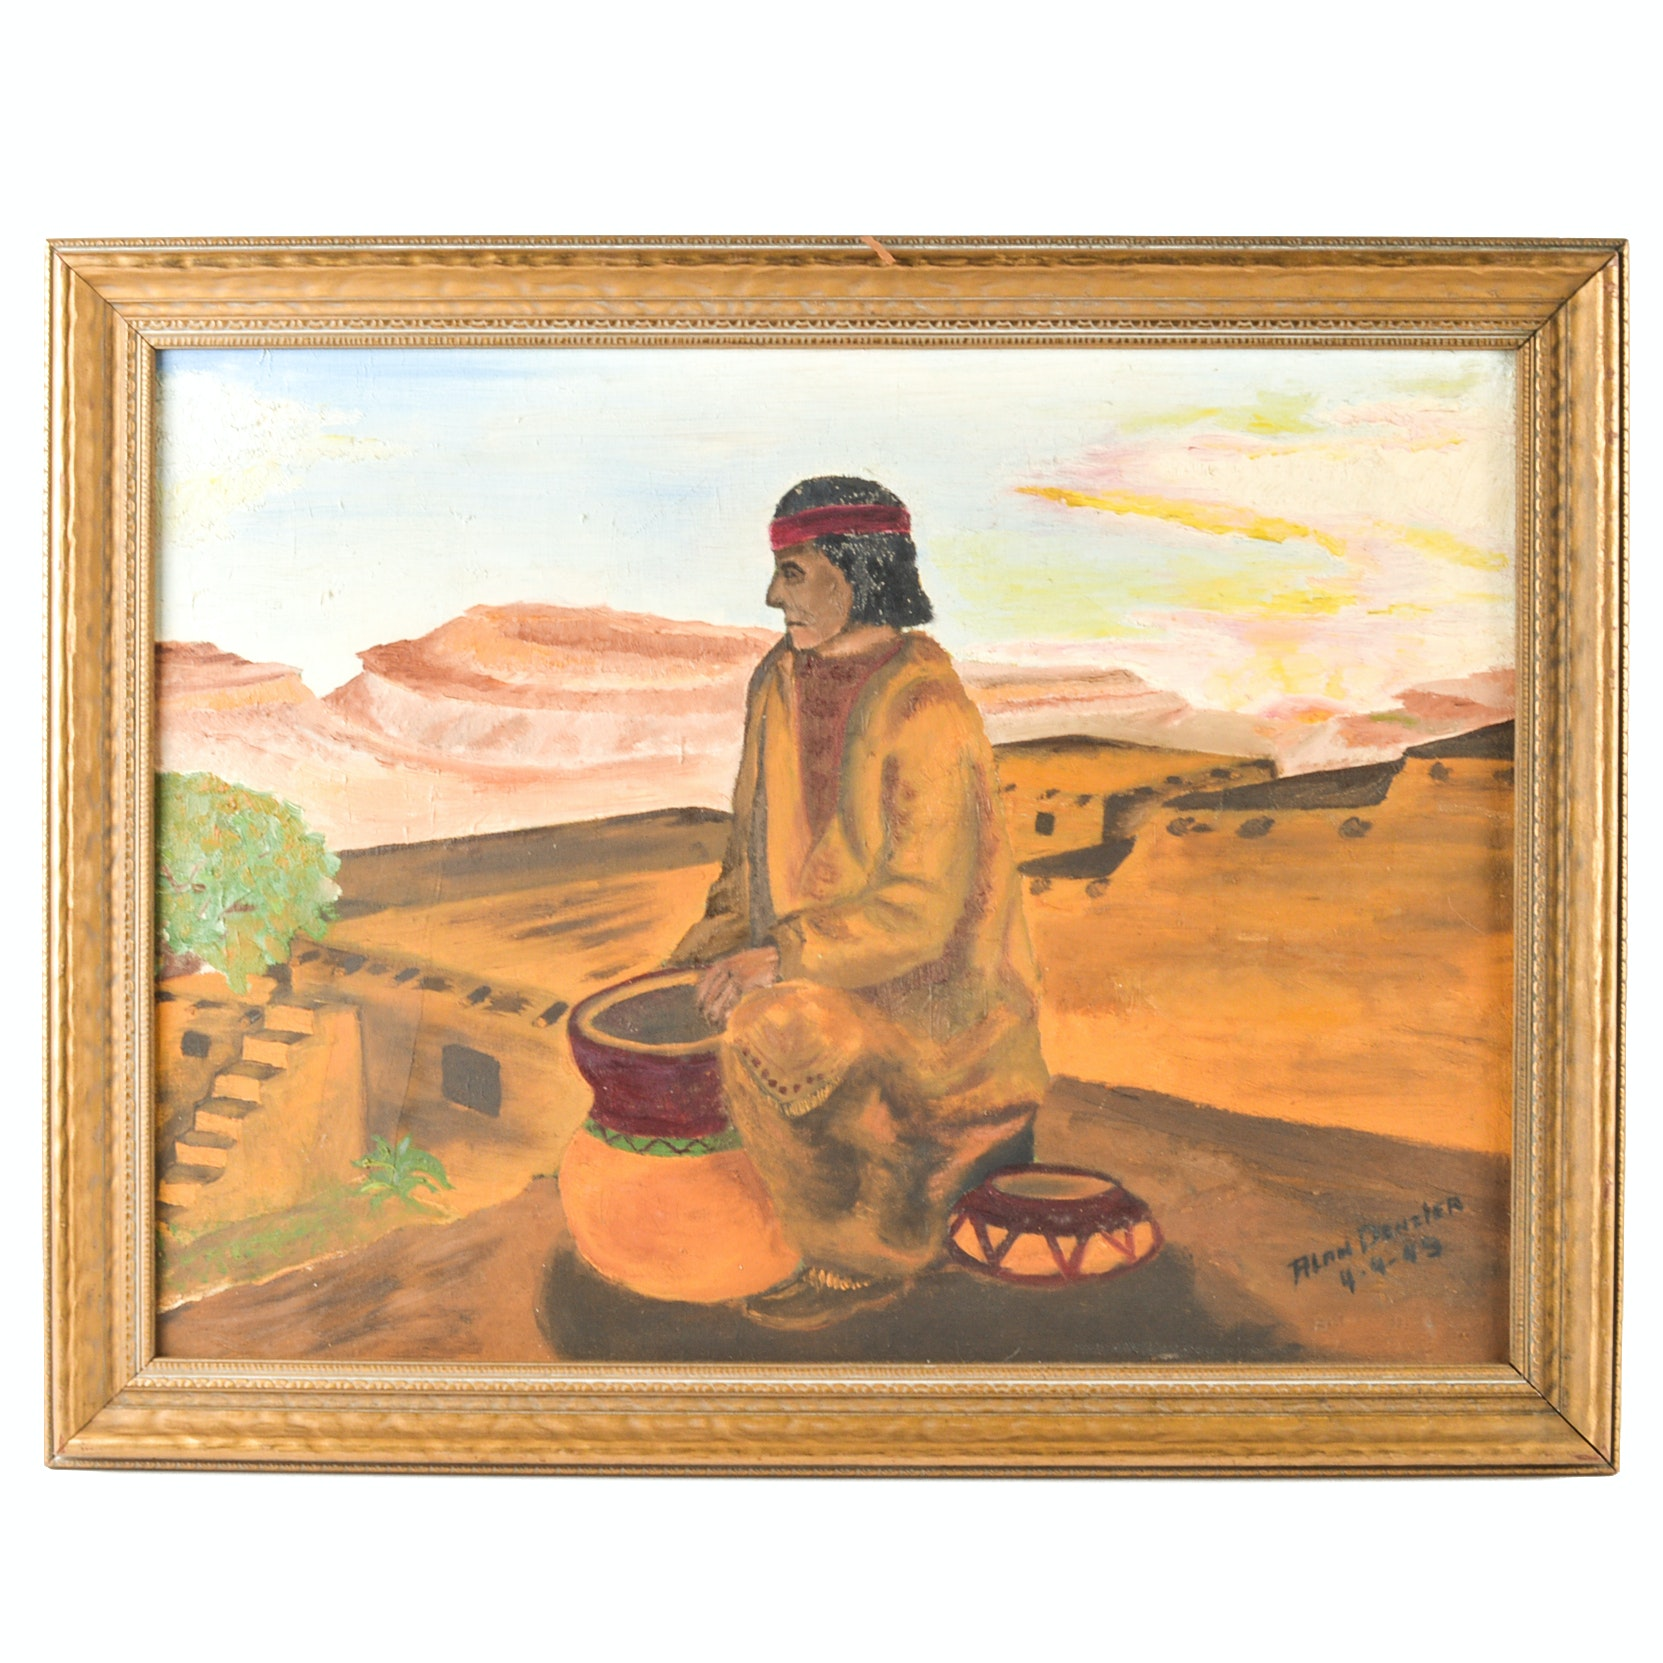 1949 Alan Denzler Original Oil on Canvas Southwestern Painting